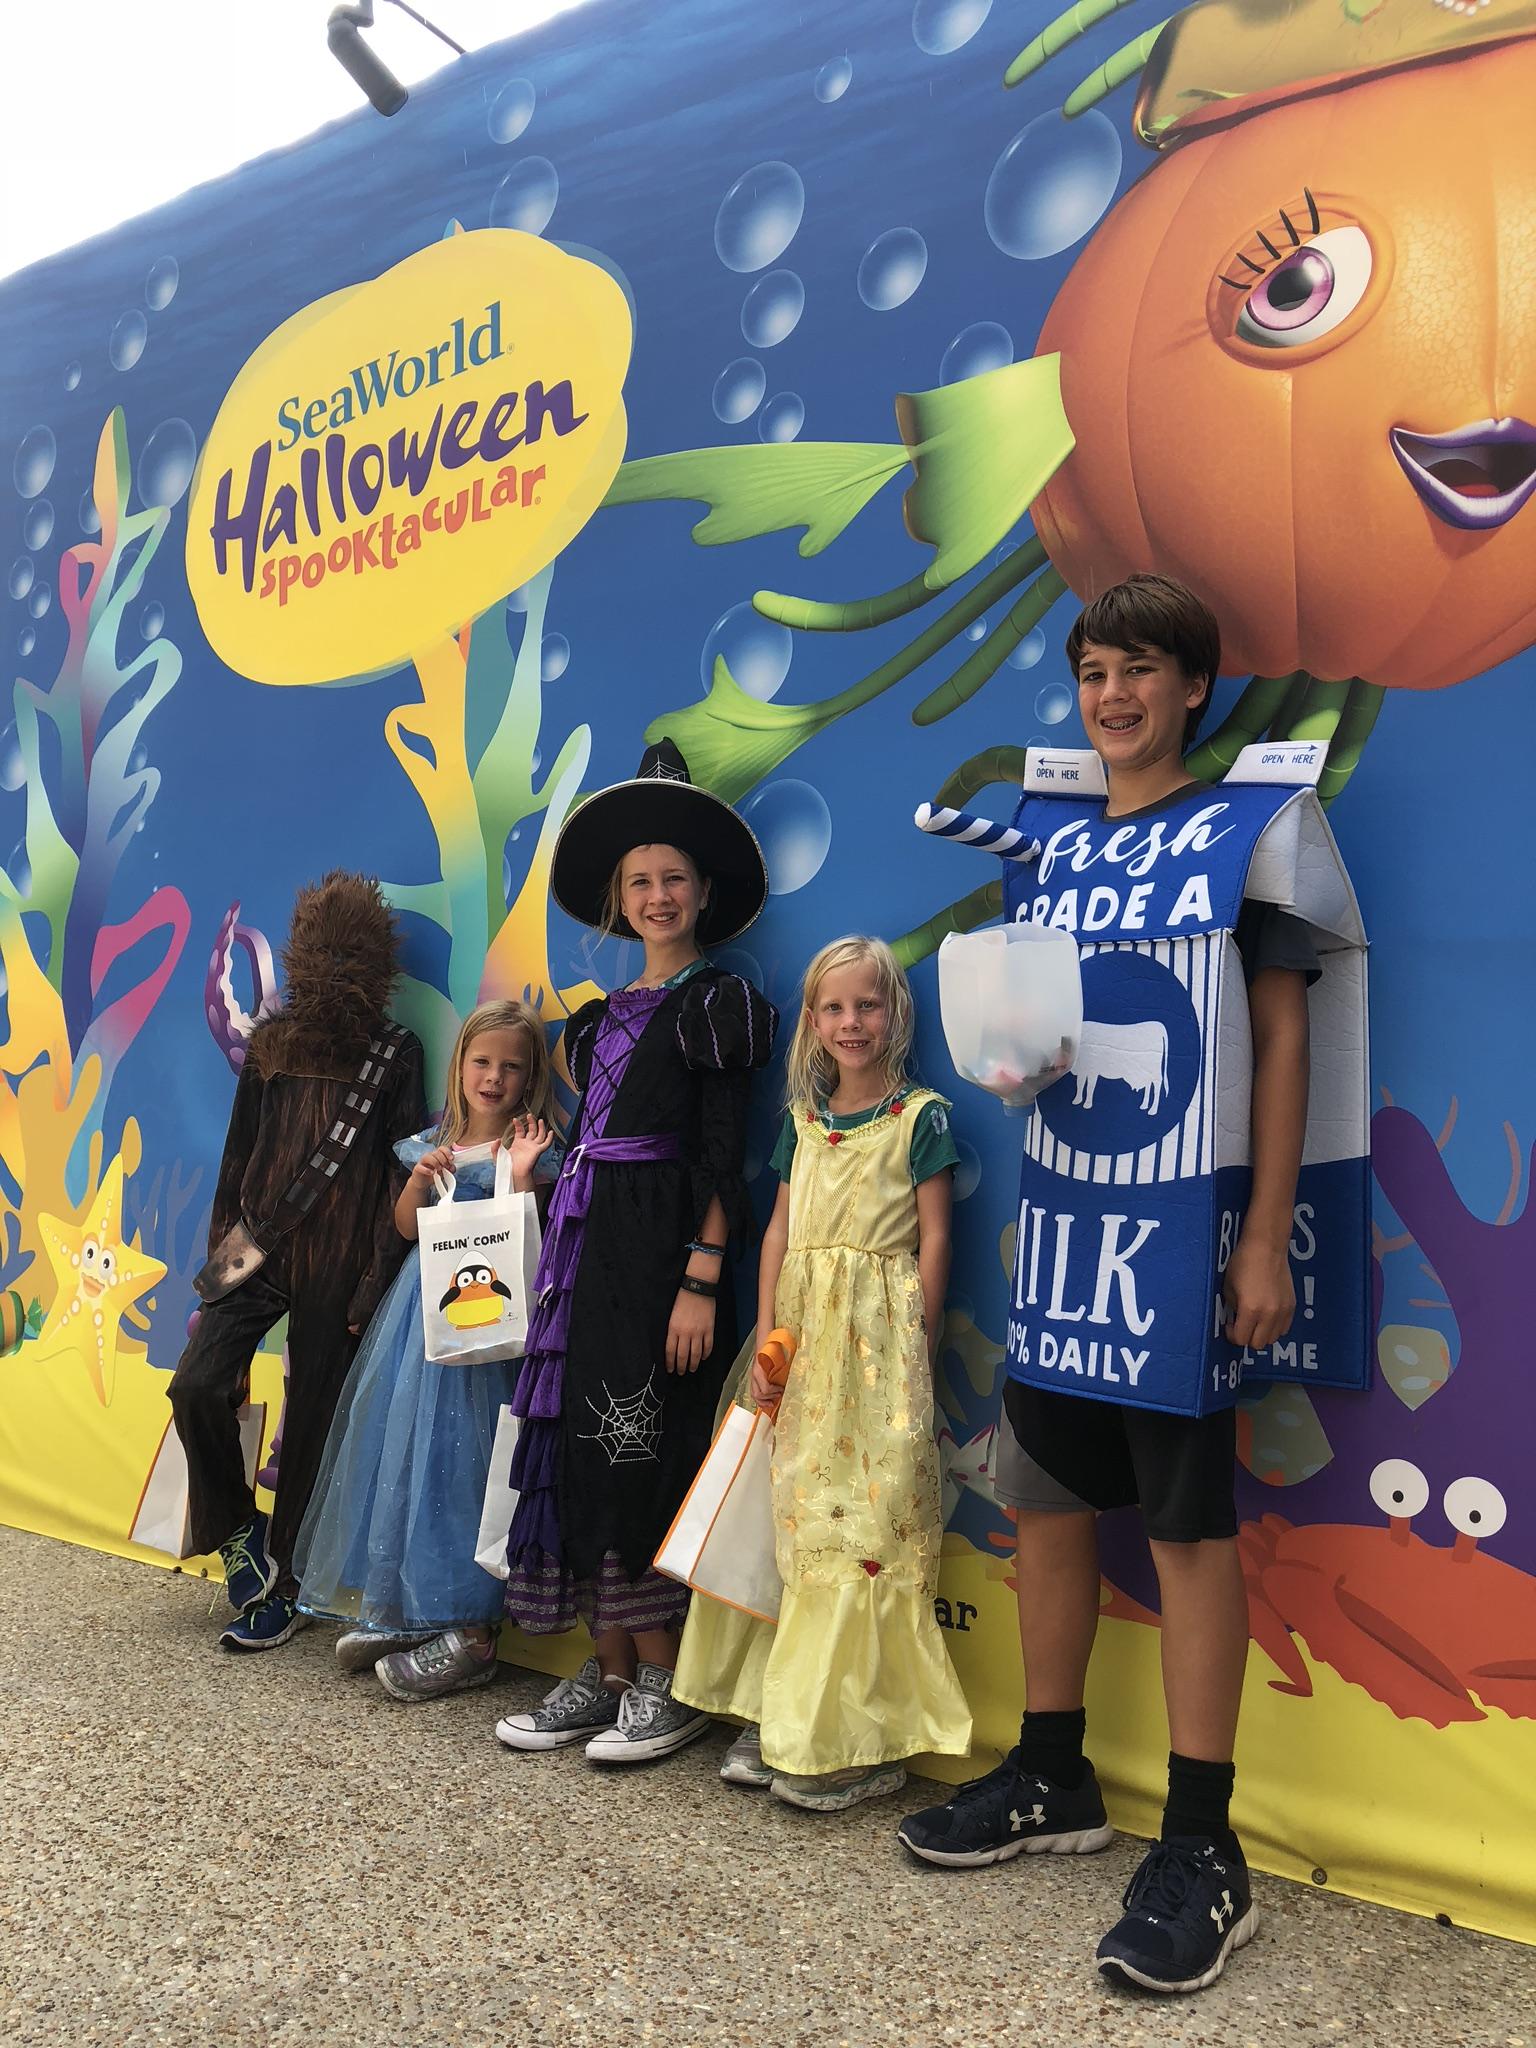 Halloween Spooktacular Seaworld.Seaworld Orlando Halloween Spooktacular Top 4 Things You